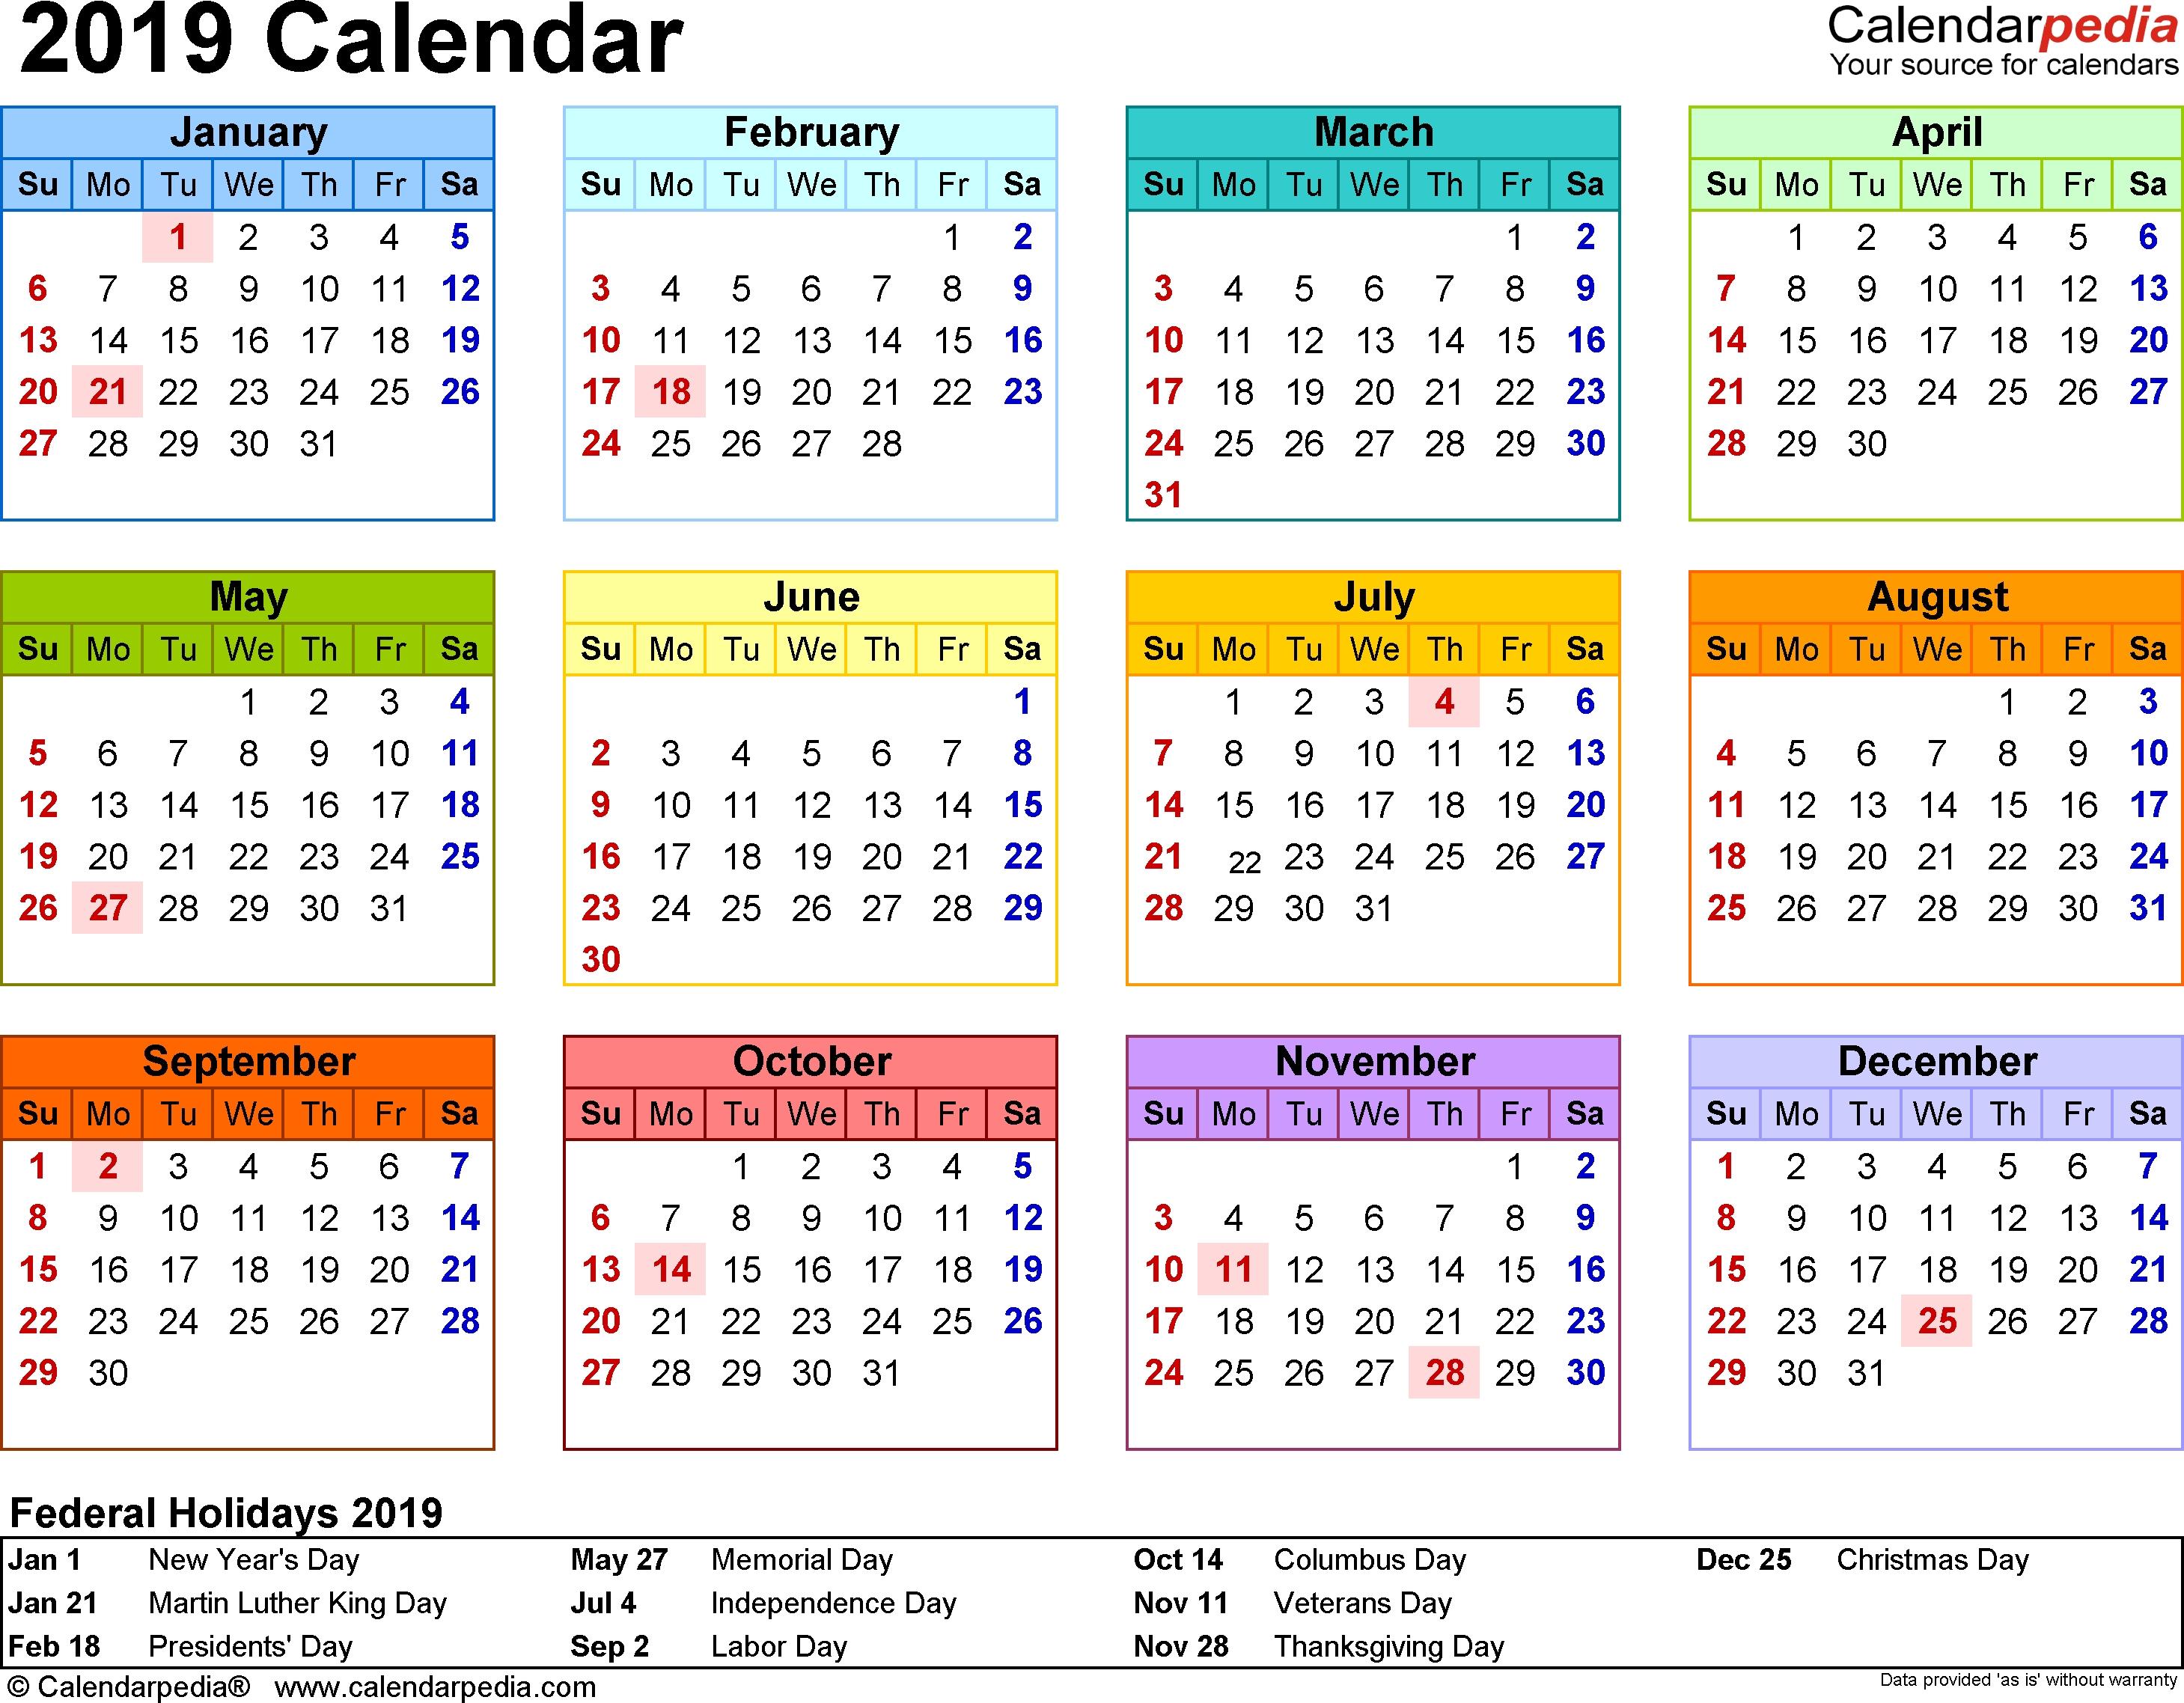 Online Calendar 2019 Printable - Baret.houseofstrauss.co